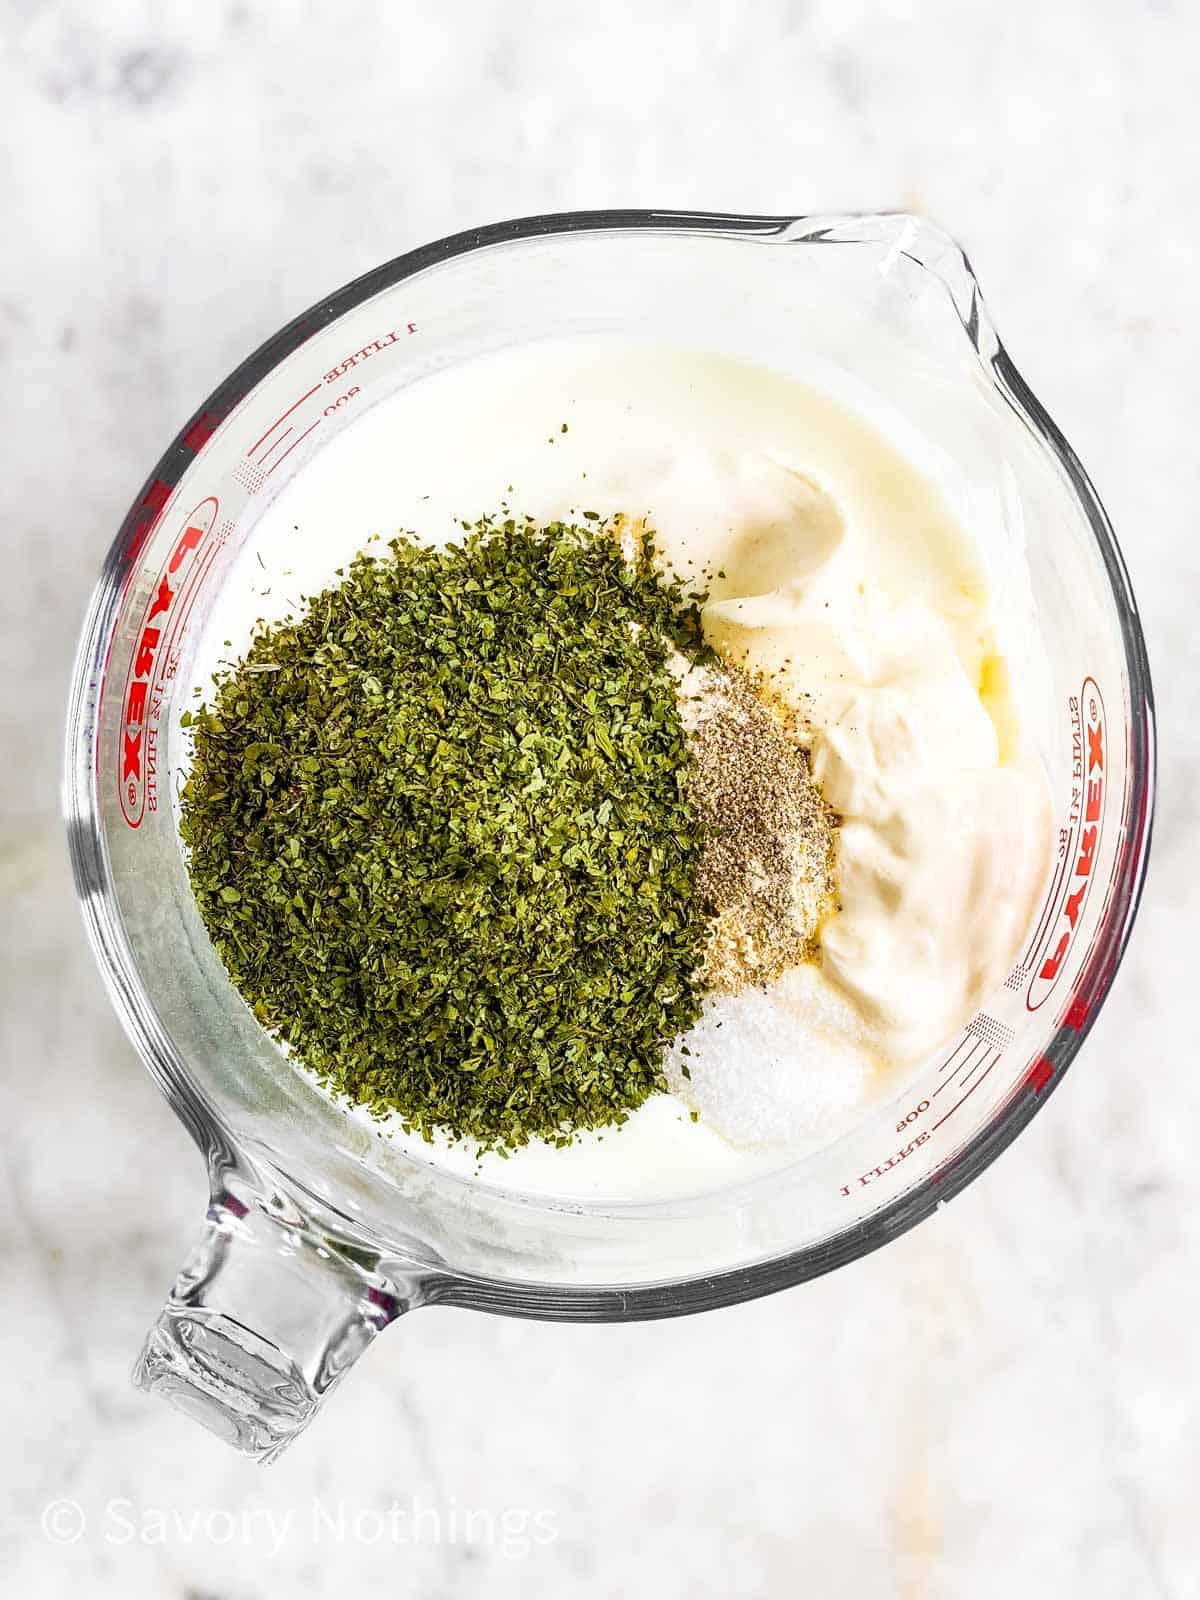 ingredients for ranch salad dressing in glass measuring jug